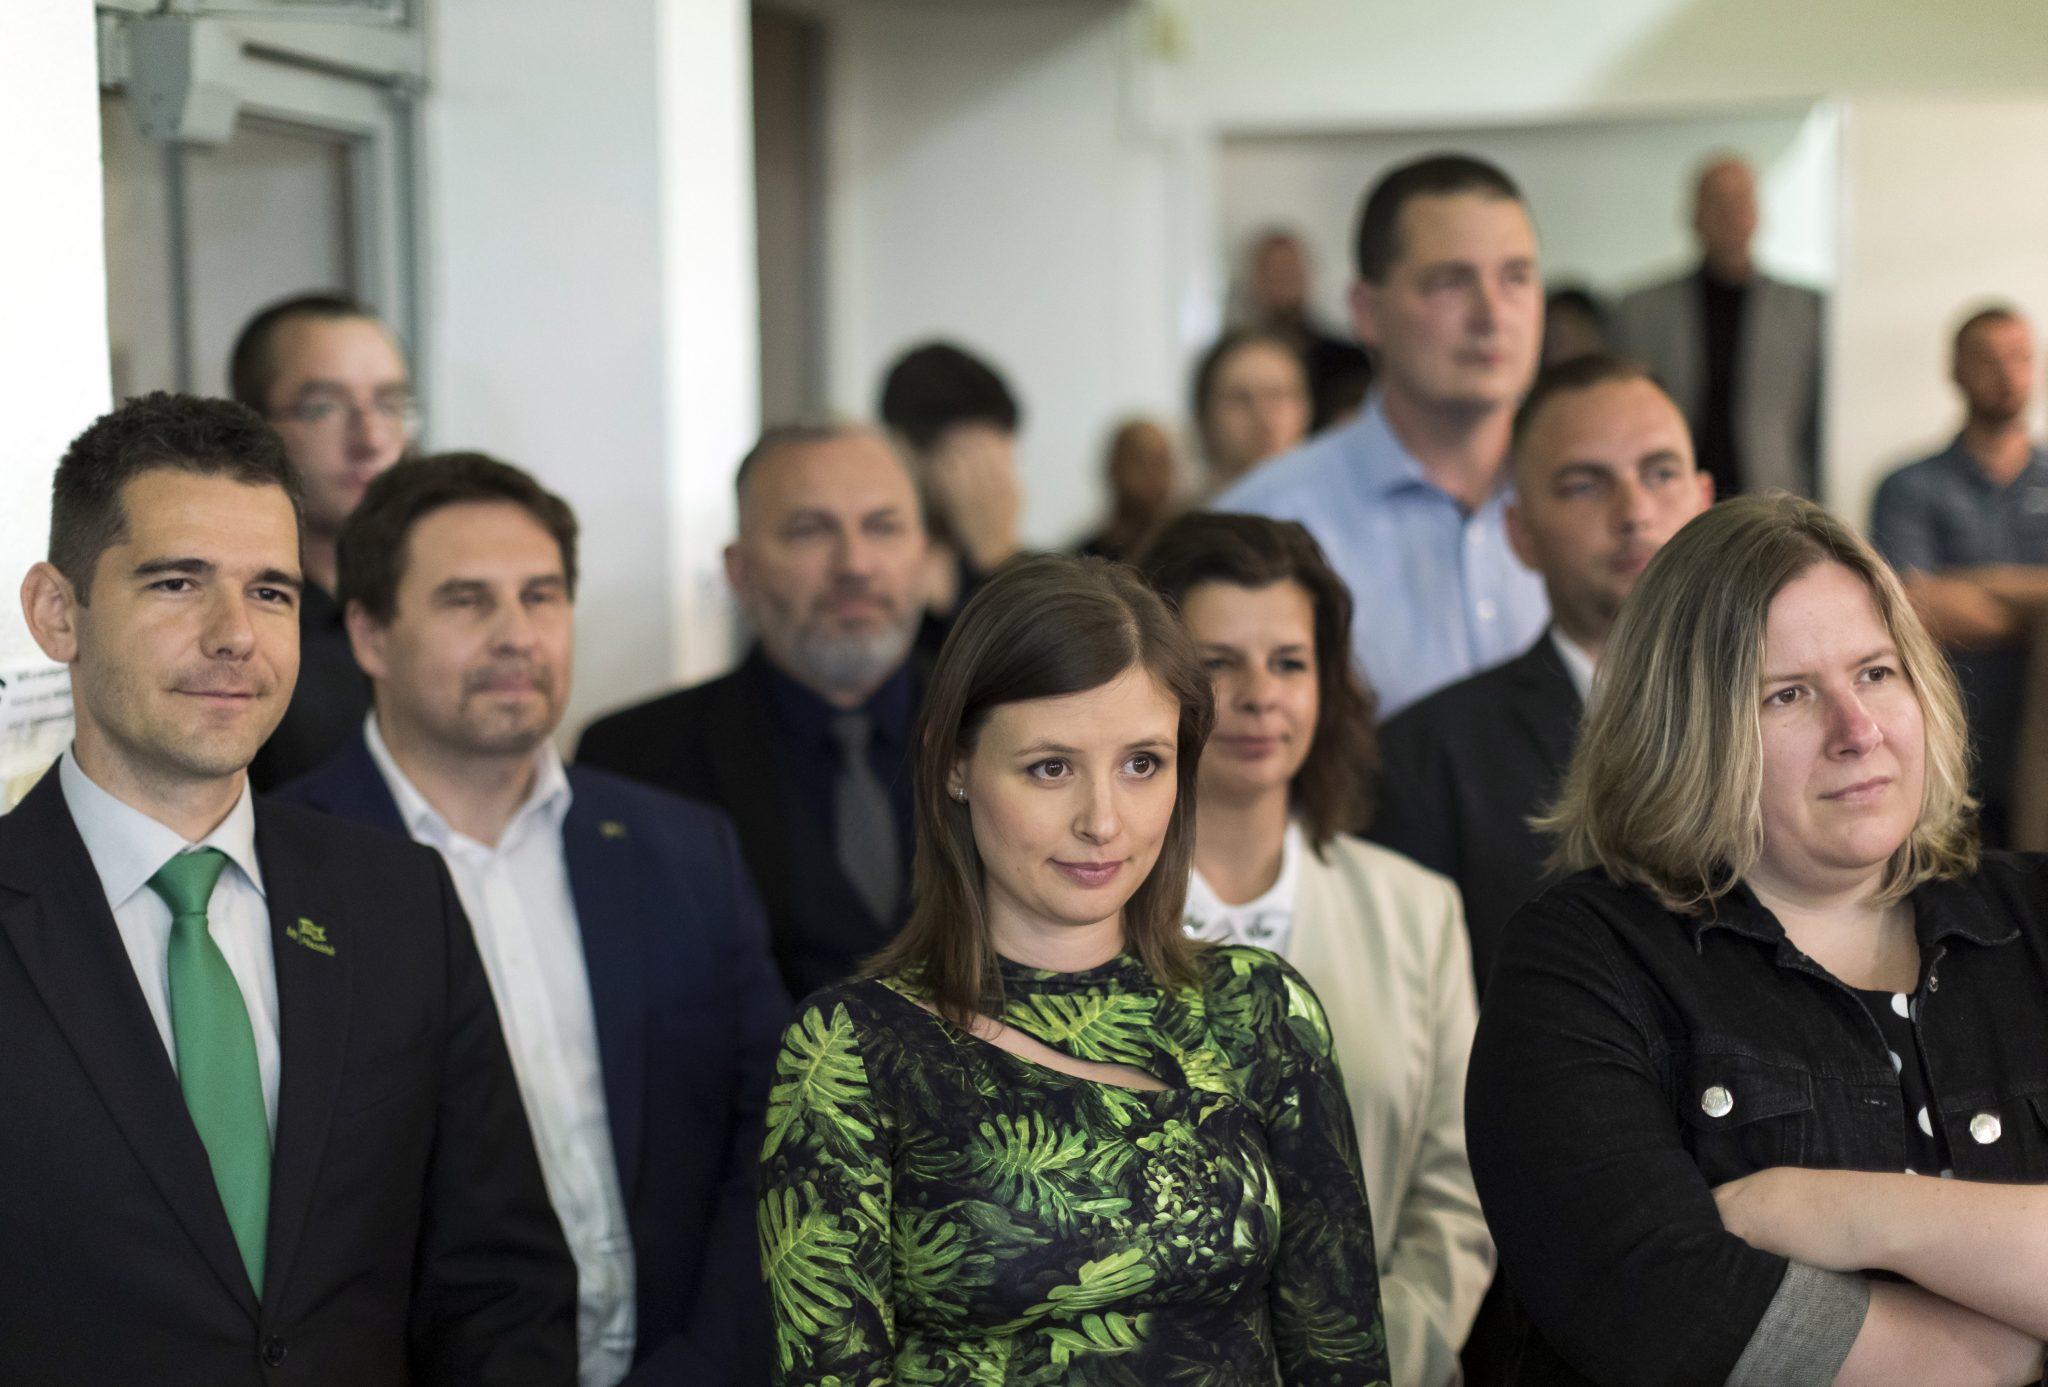 Budaházy: 'Let's Face It, Fidesz is Helping Mi Hazánk'